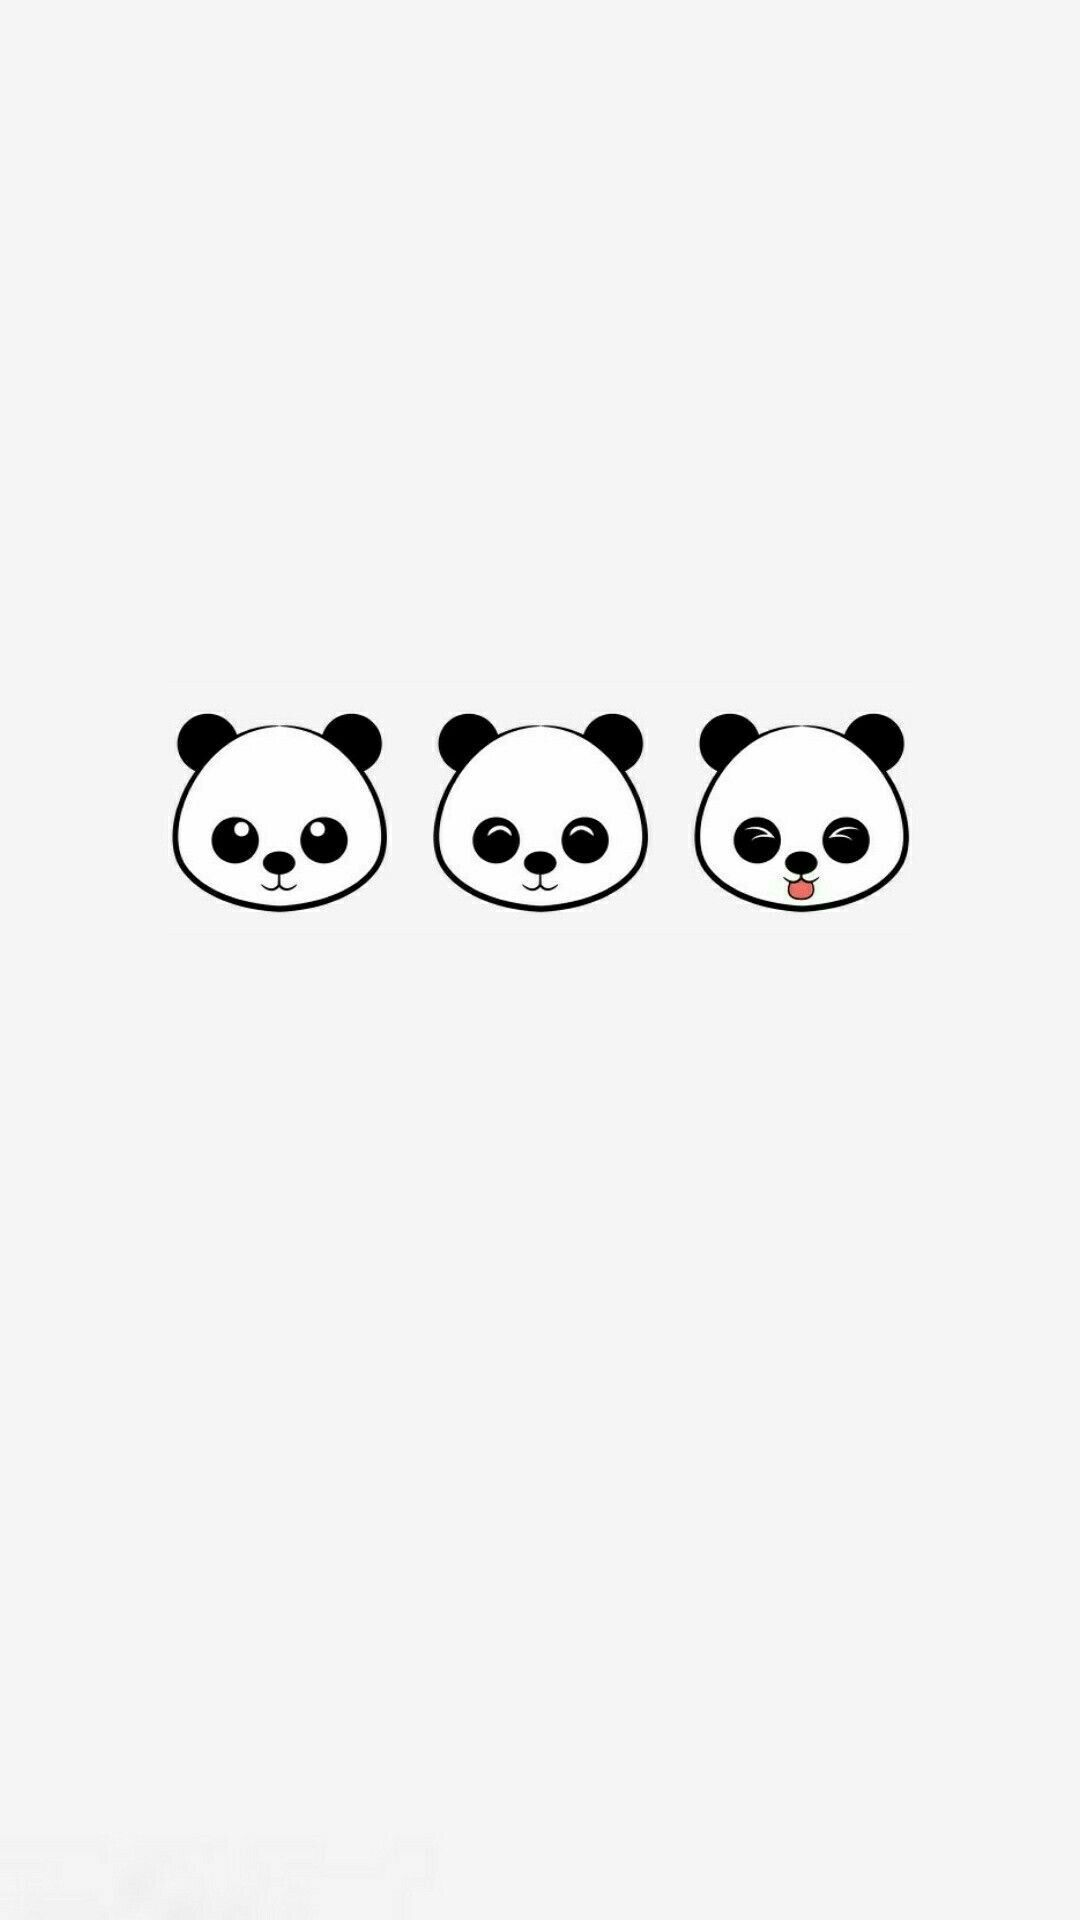 Wallpaper Tumblr Panda Cute For Iphone Wallpaper Iphone Cute Panda Wallpaper Panda Wallpapers Panda Background